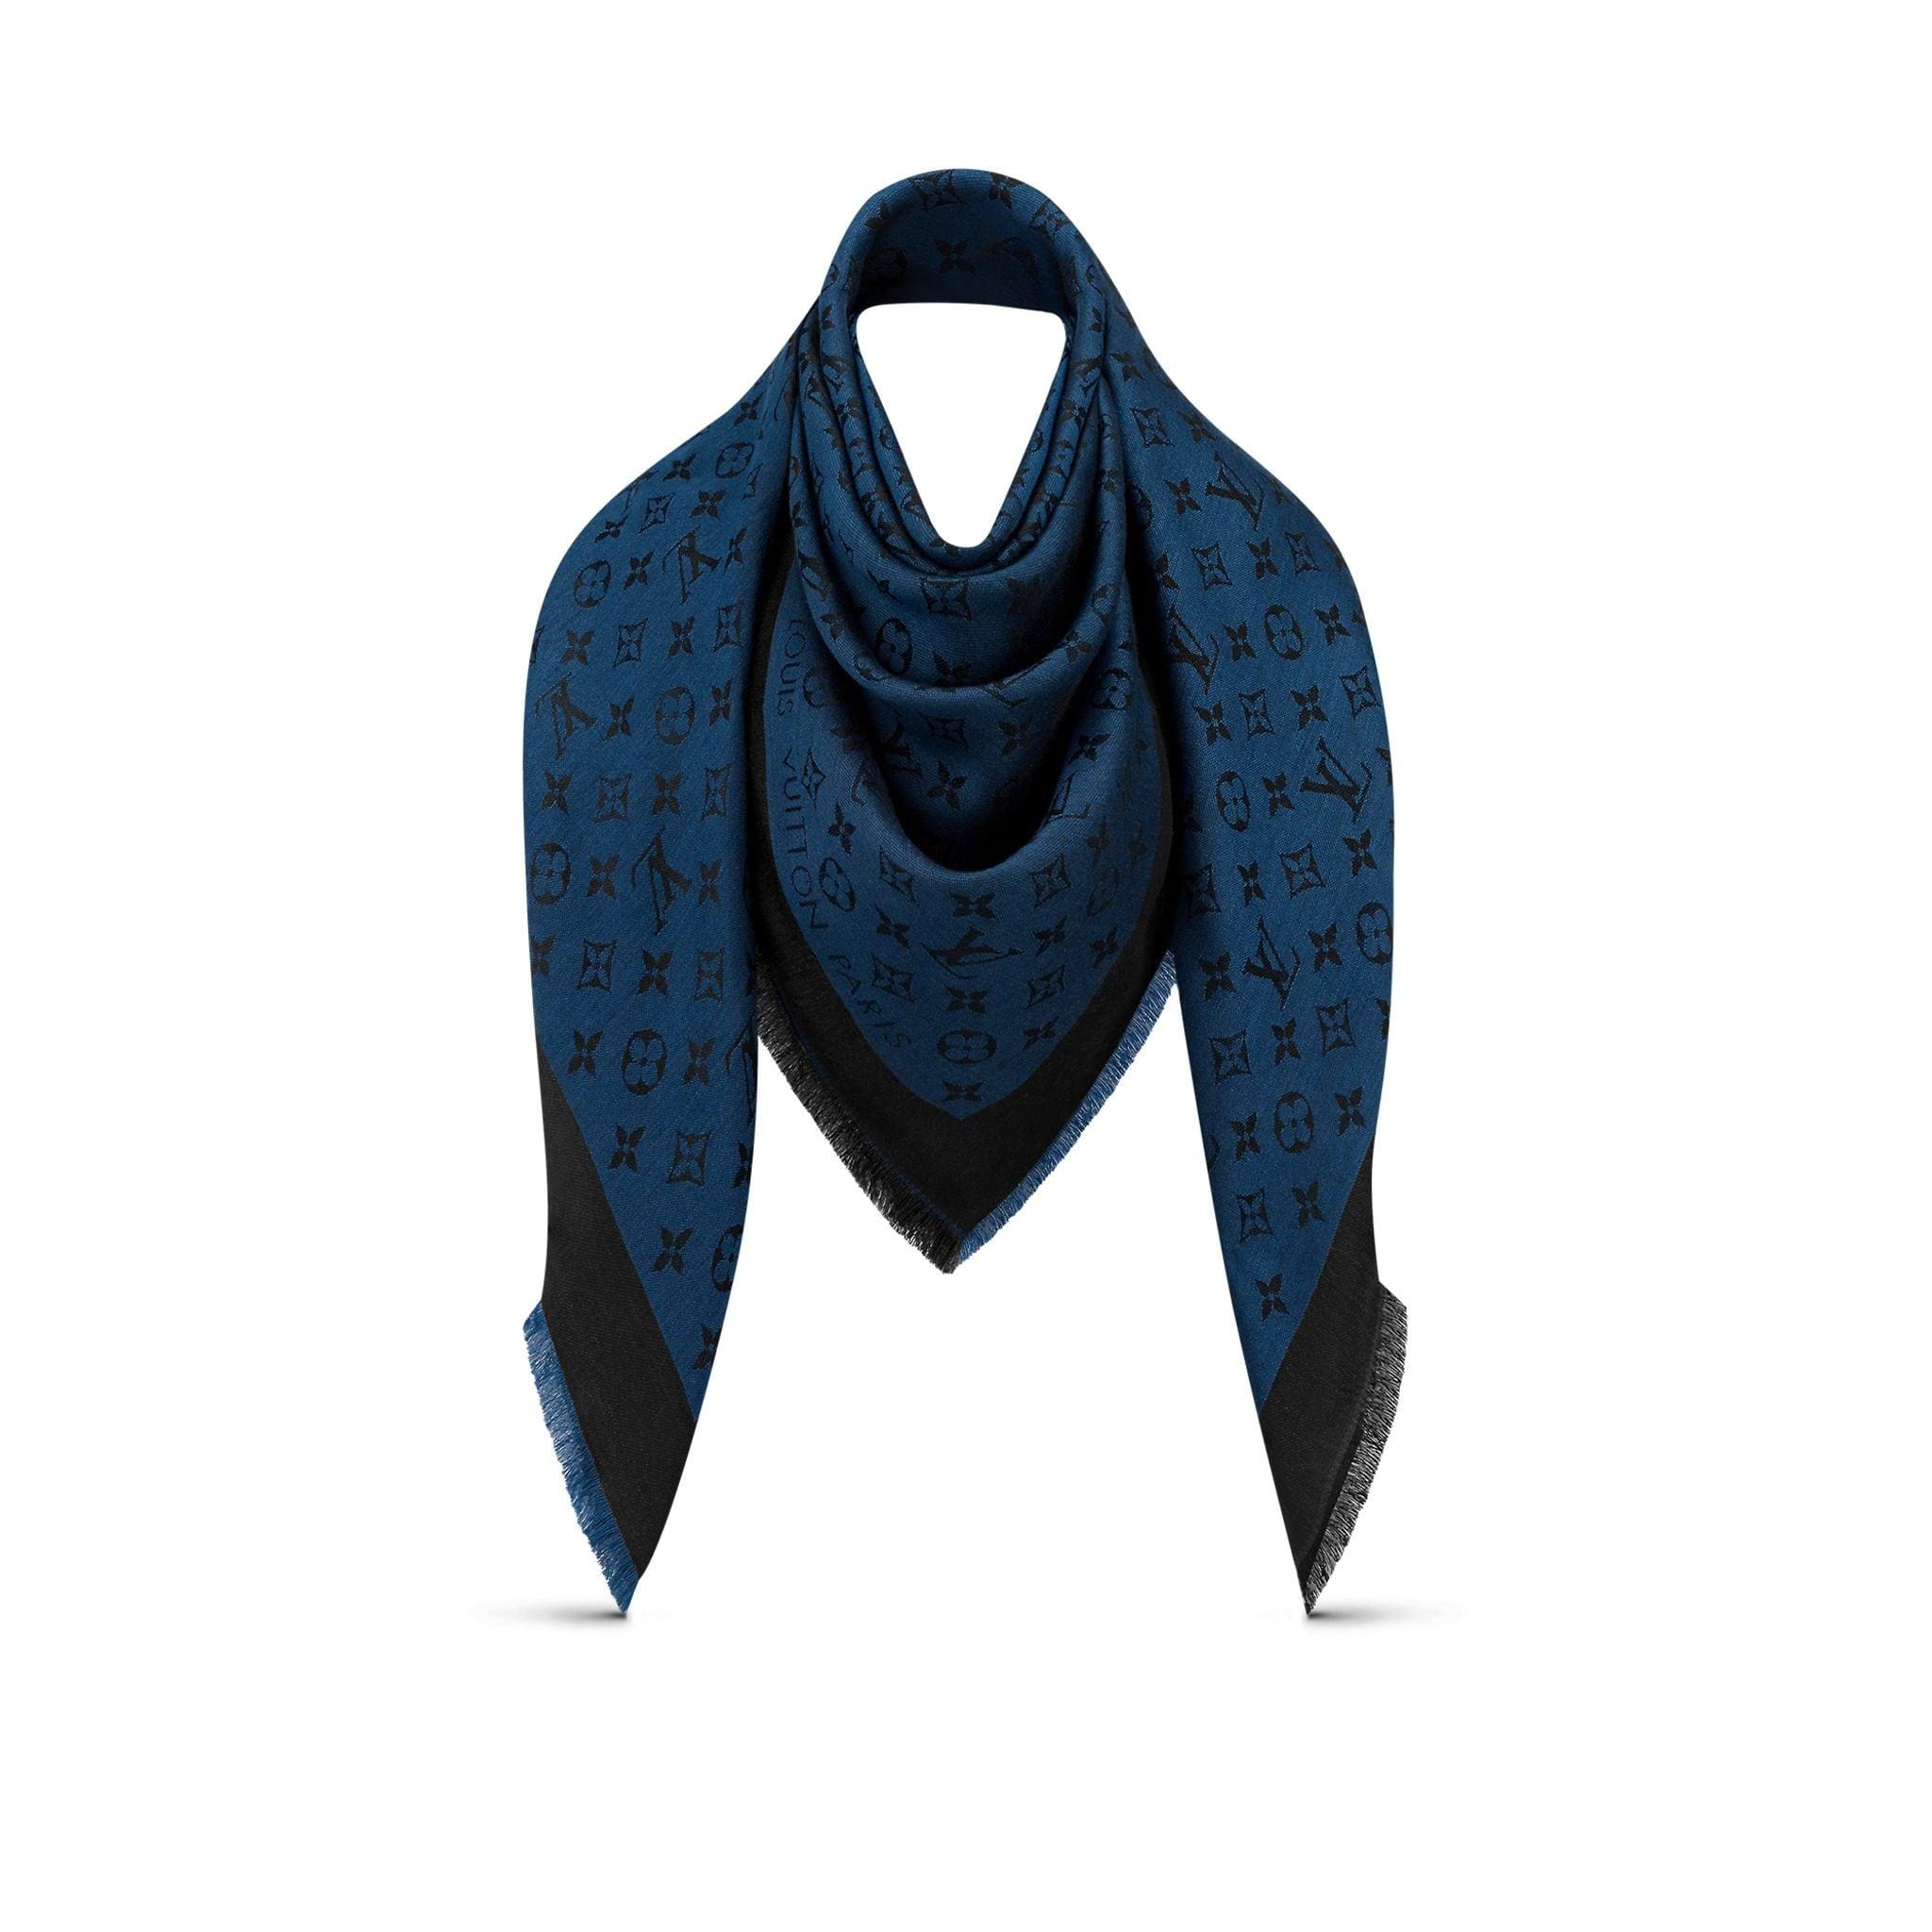 scialle Monogram Denim Louis Vuitton